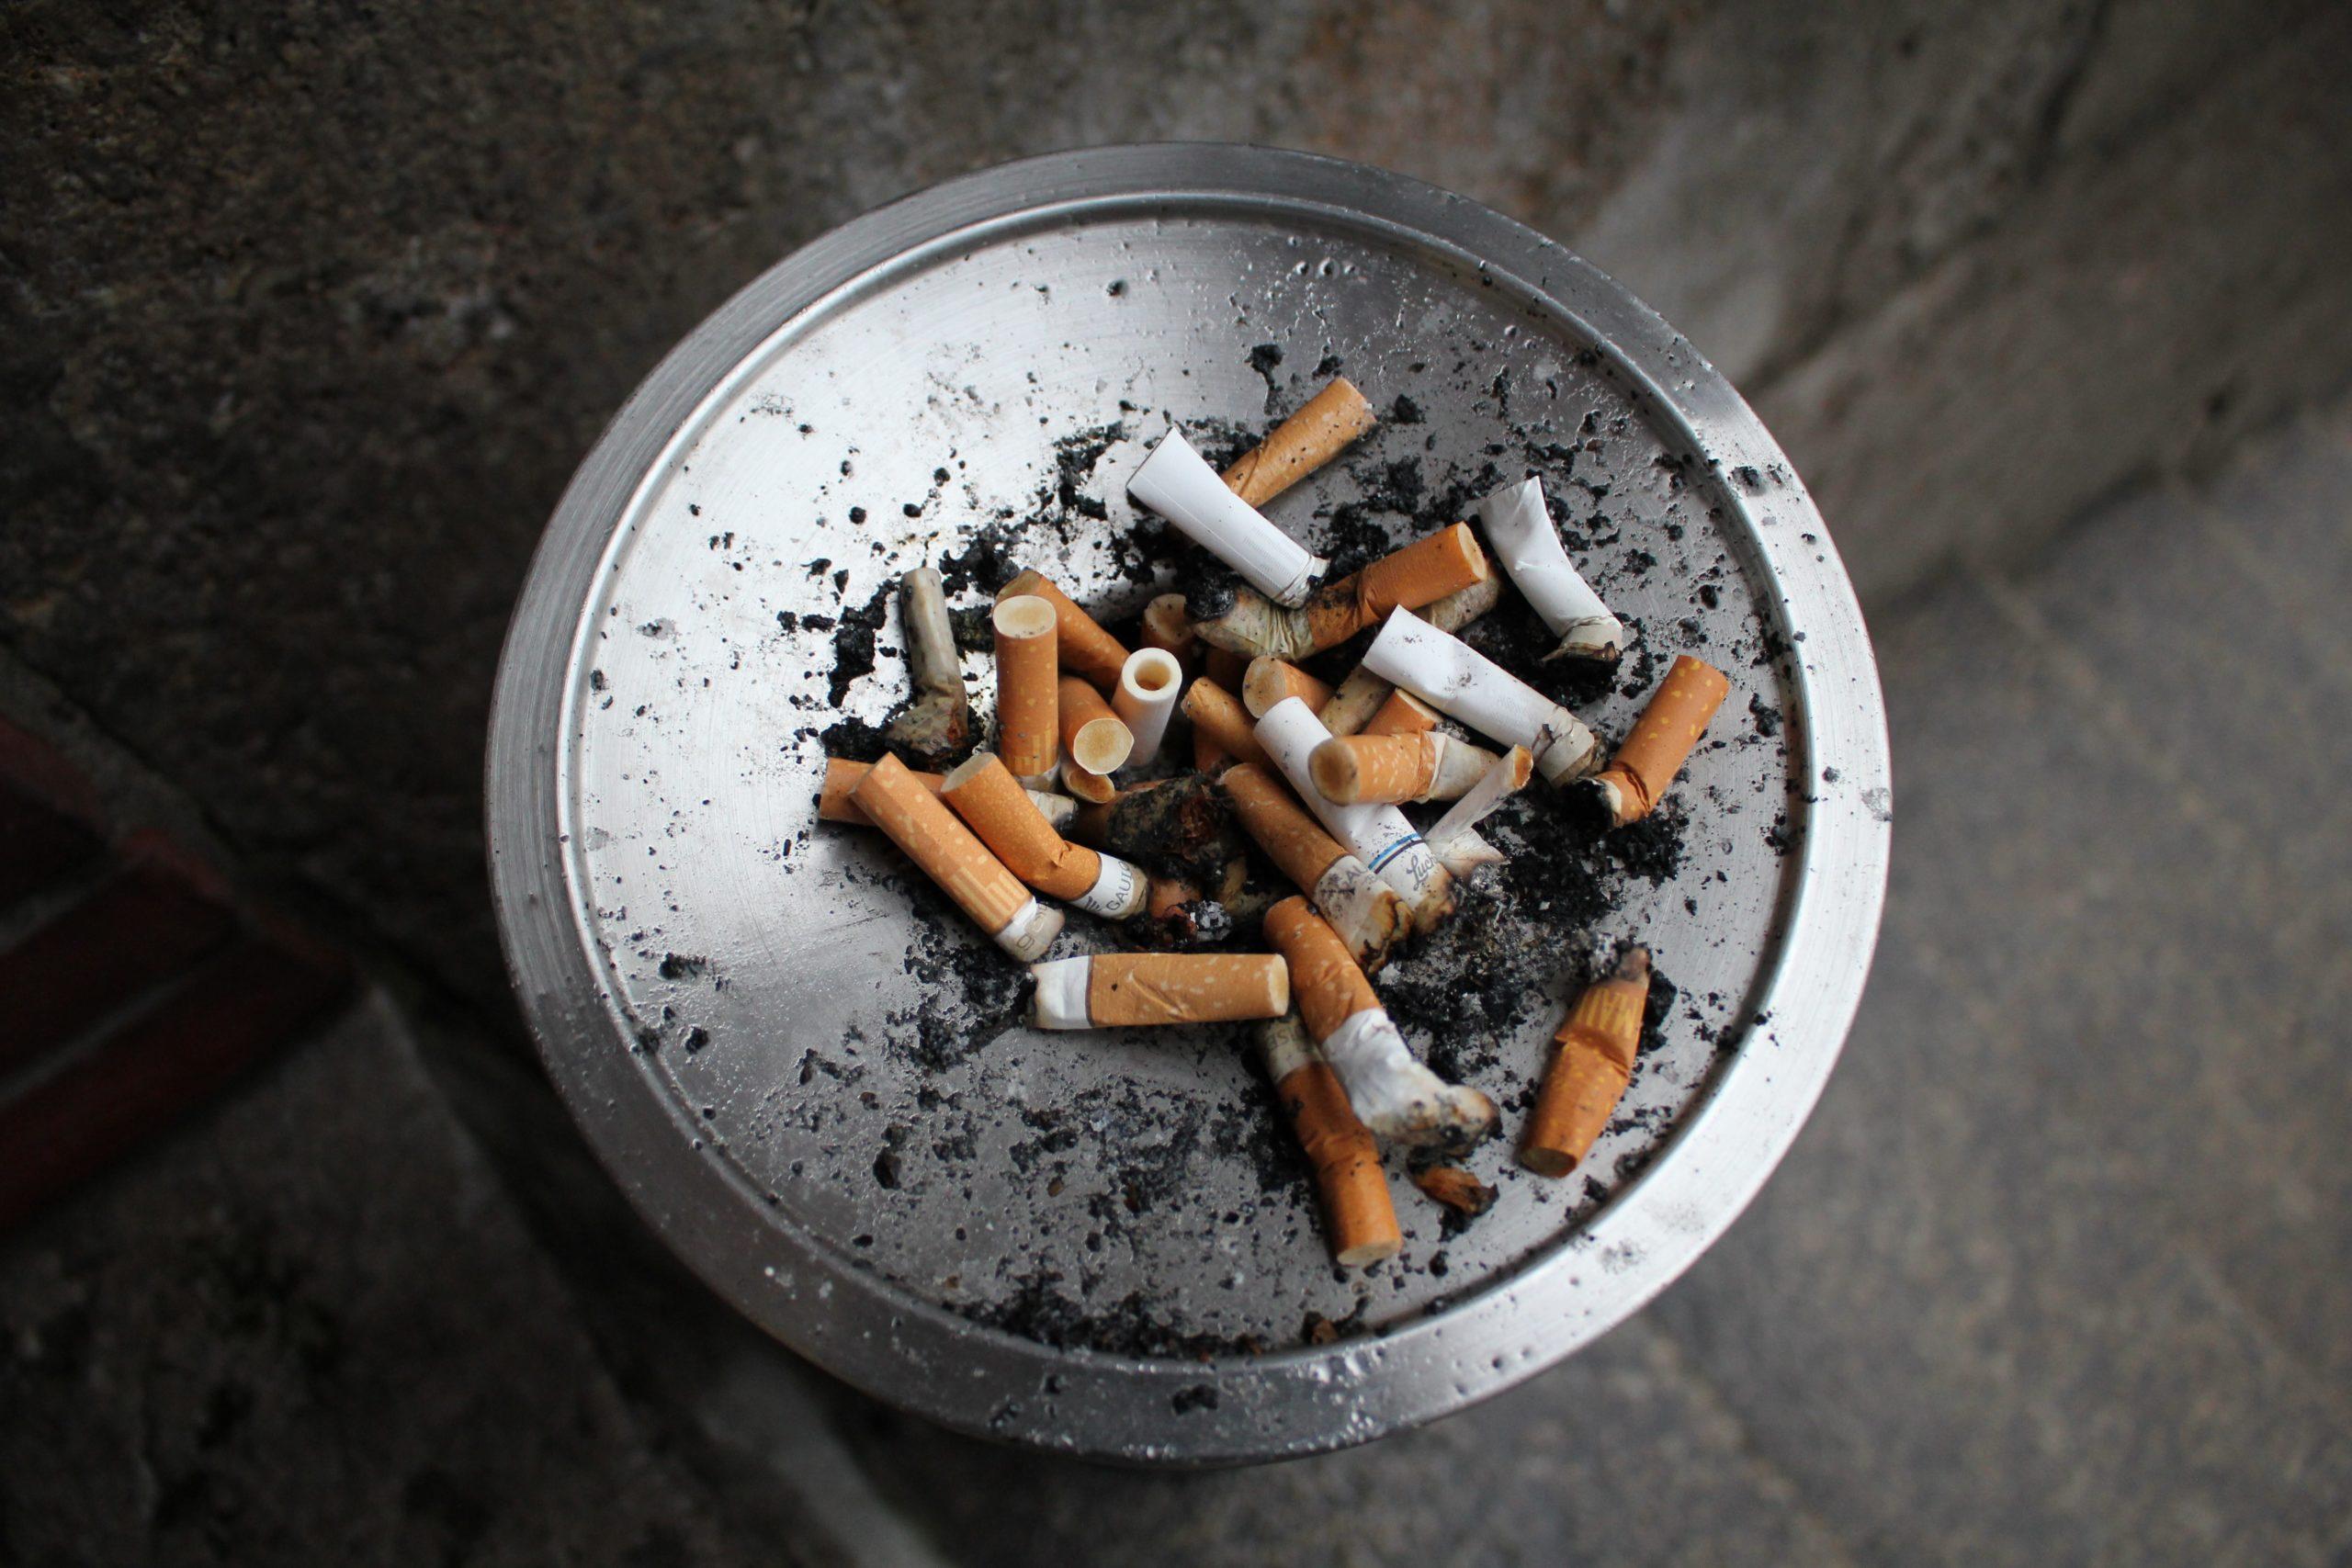 104 Days Smoke-Free and 1560 Cigarettes Not Smoked